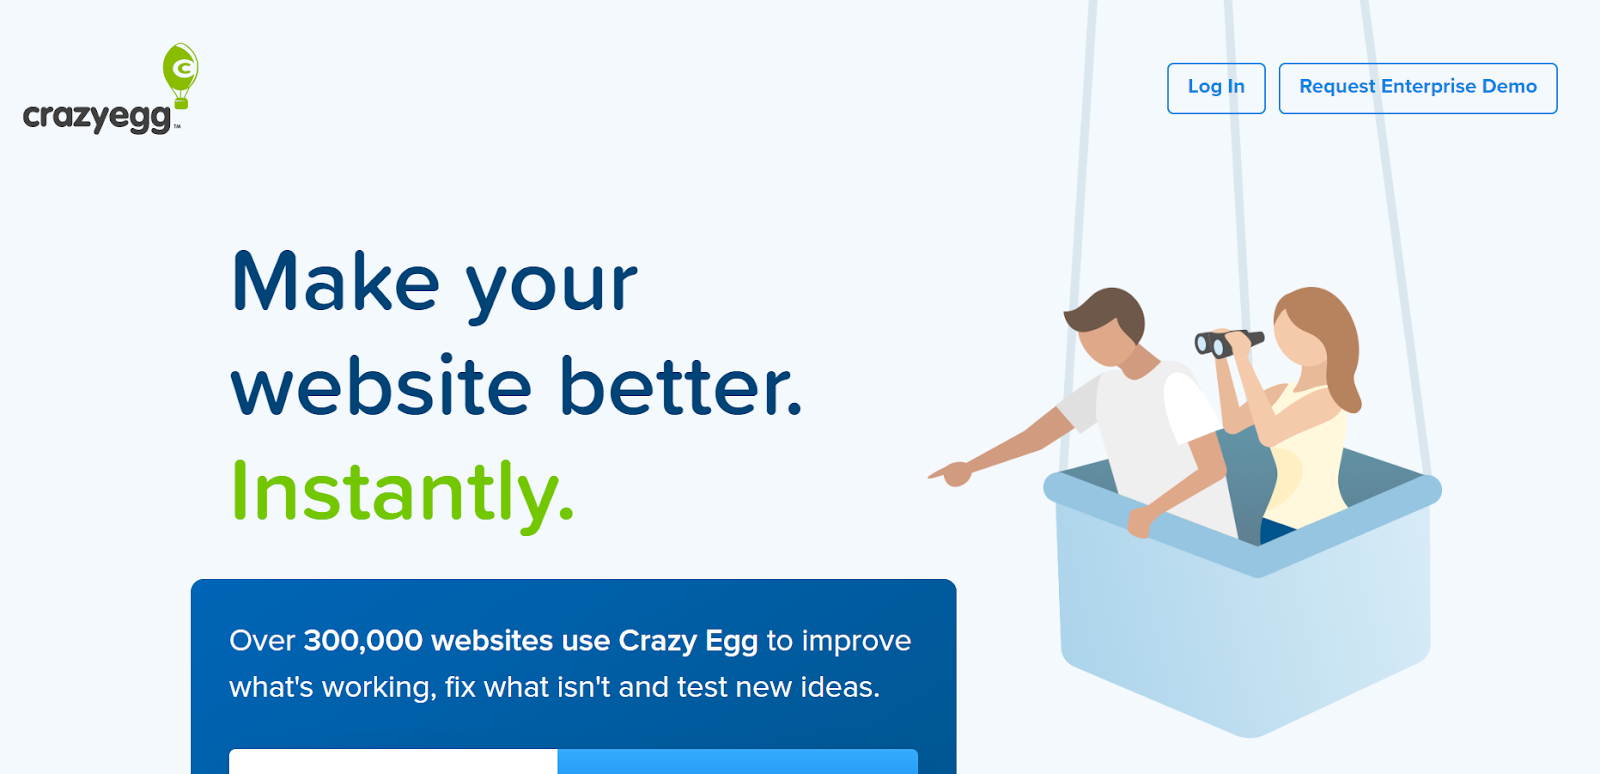 conversion rate optimization tools CrazyEgg